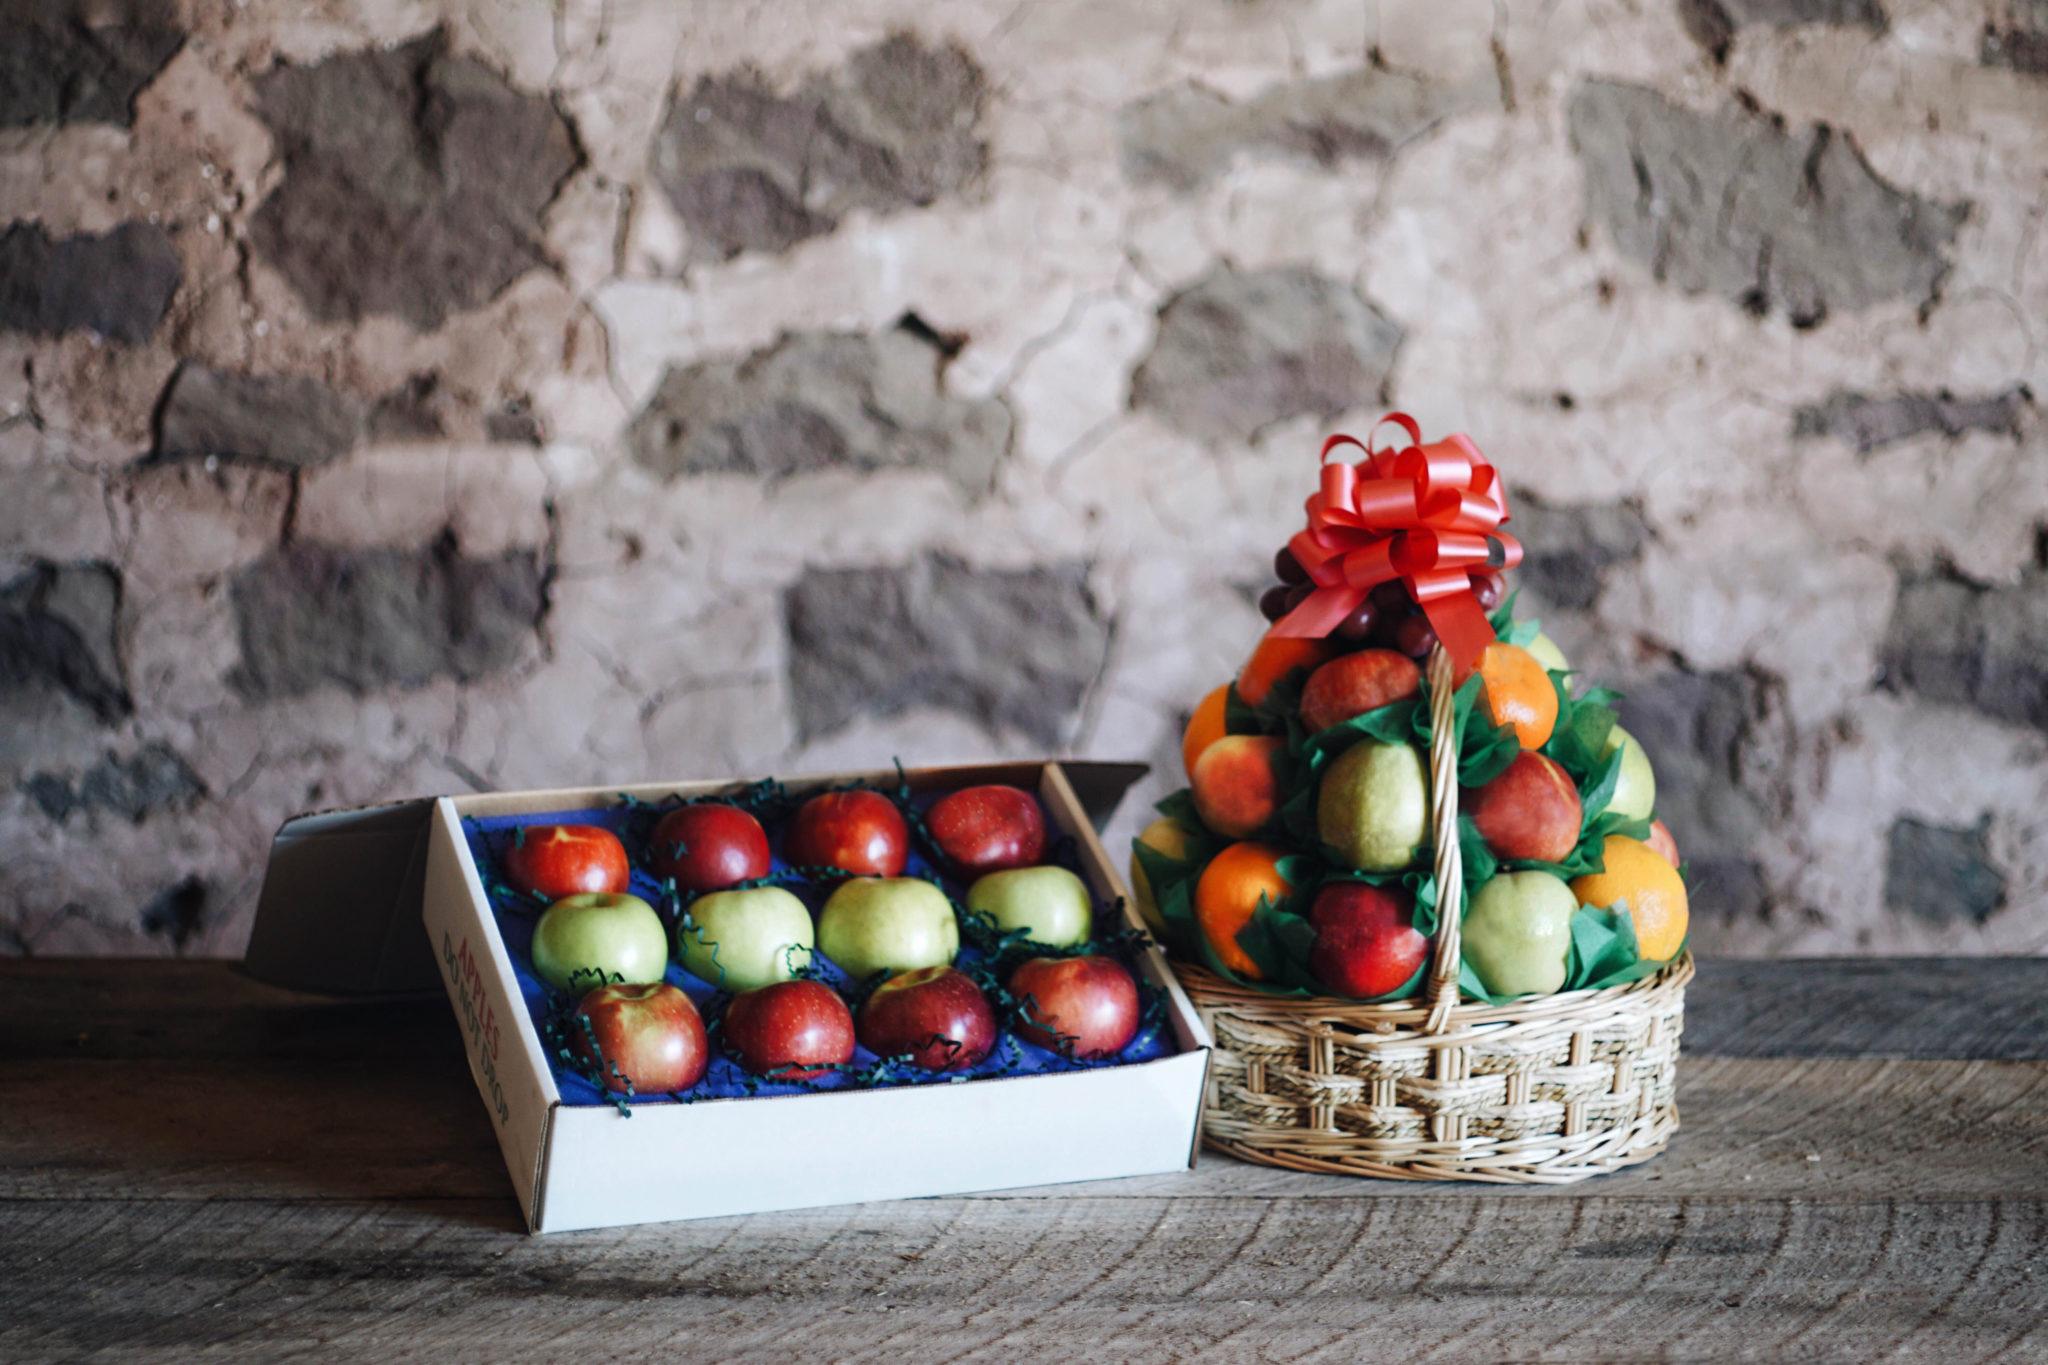 Office Gift Basket Ideas Fruit Toughkenamon Pa from mk0judabubom045xgkno.kinstacdn.com